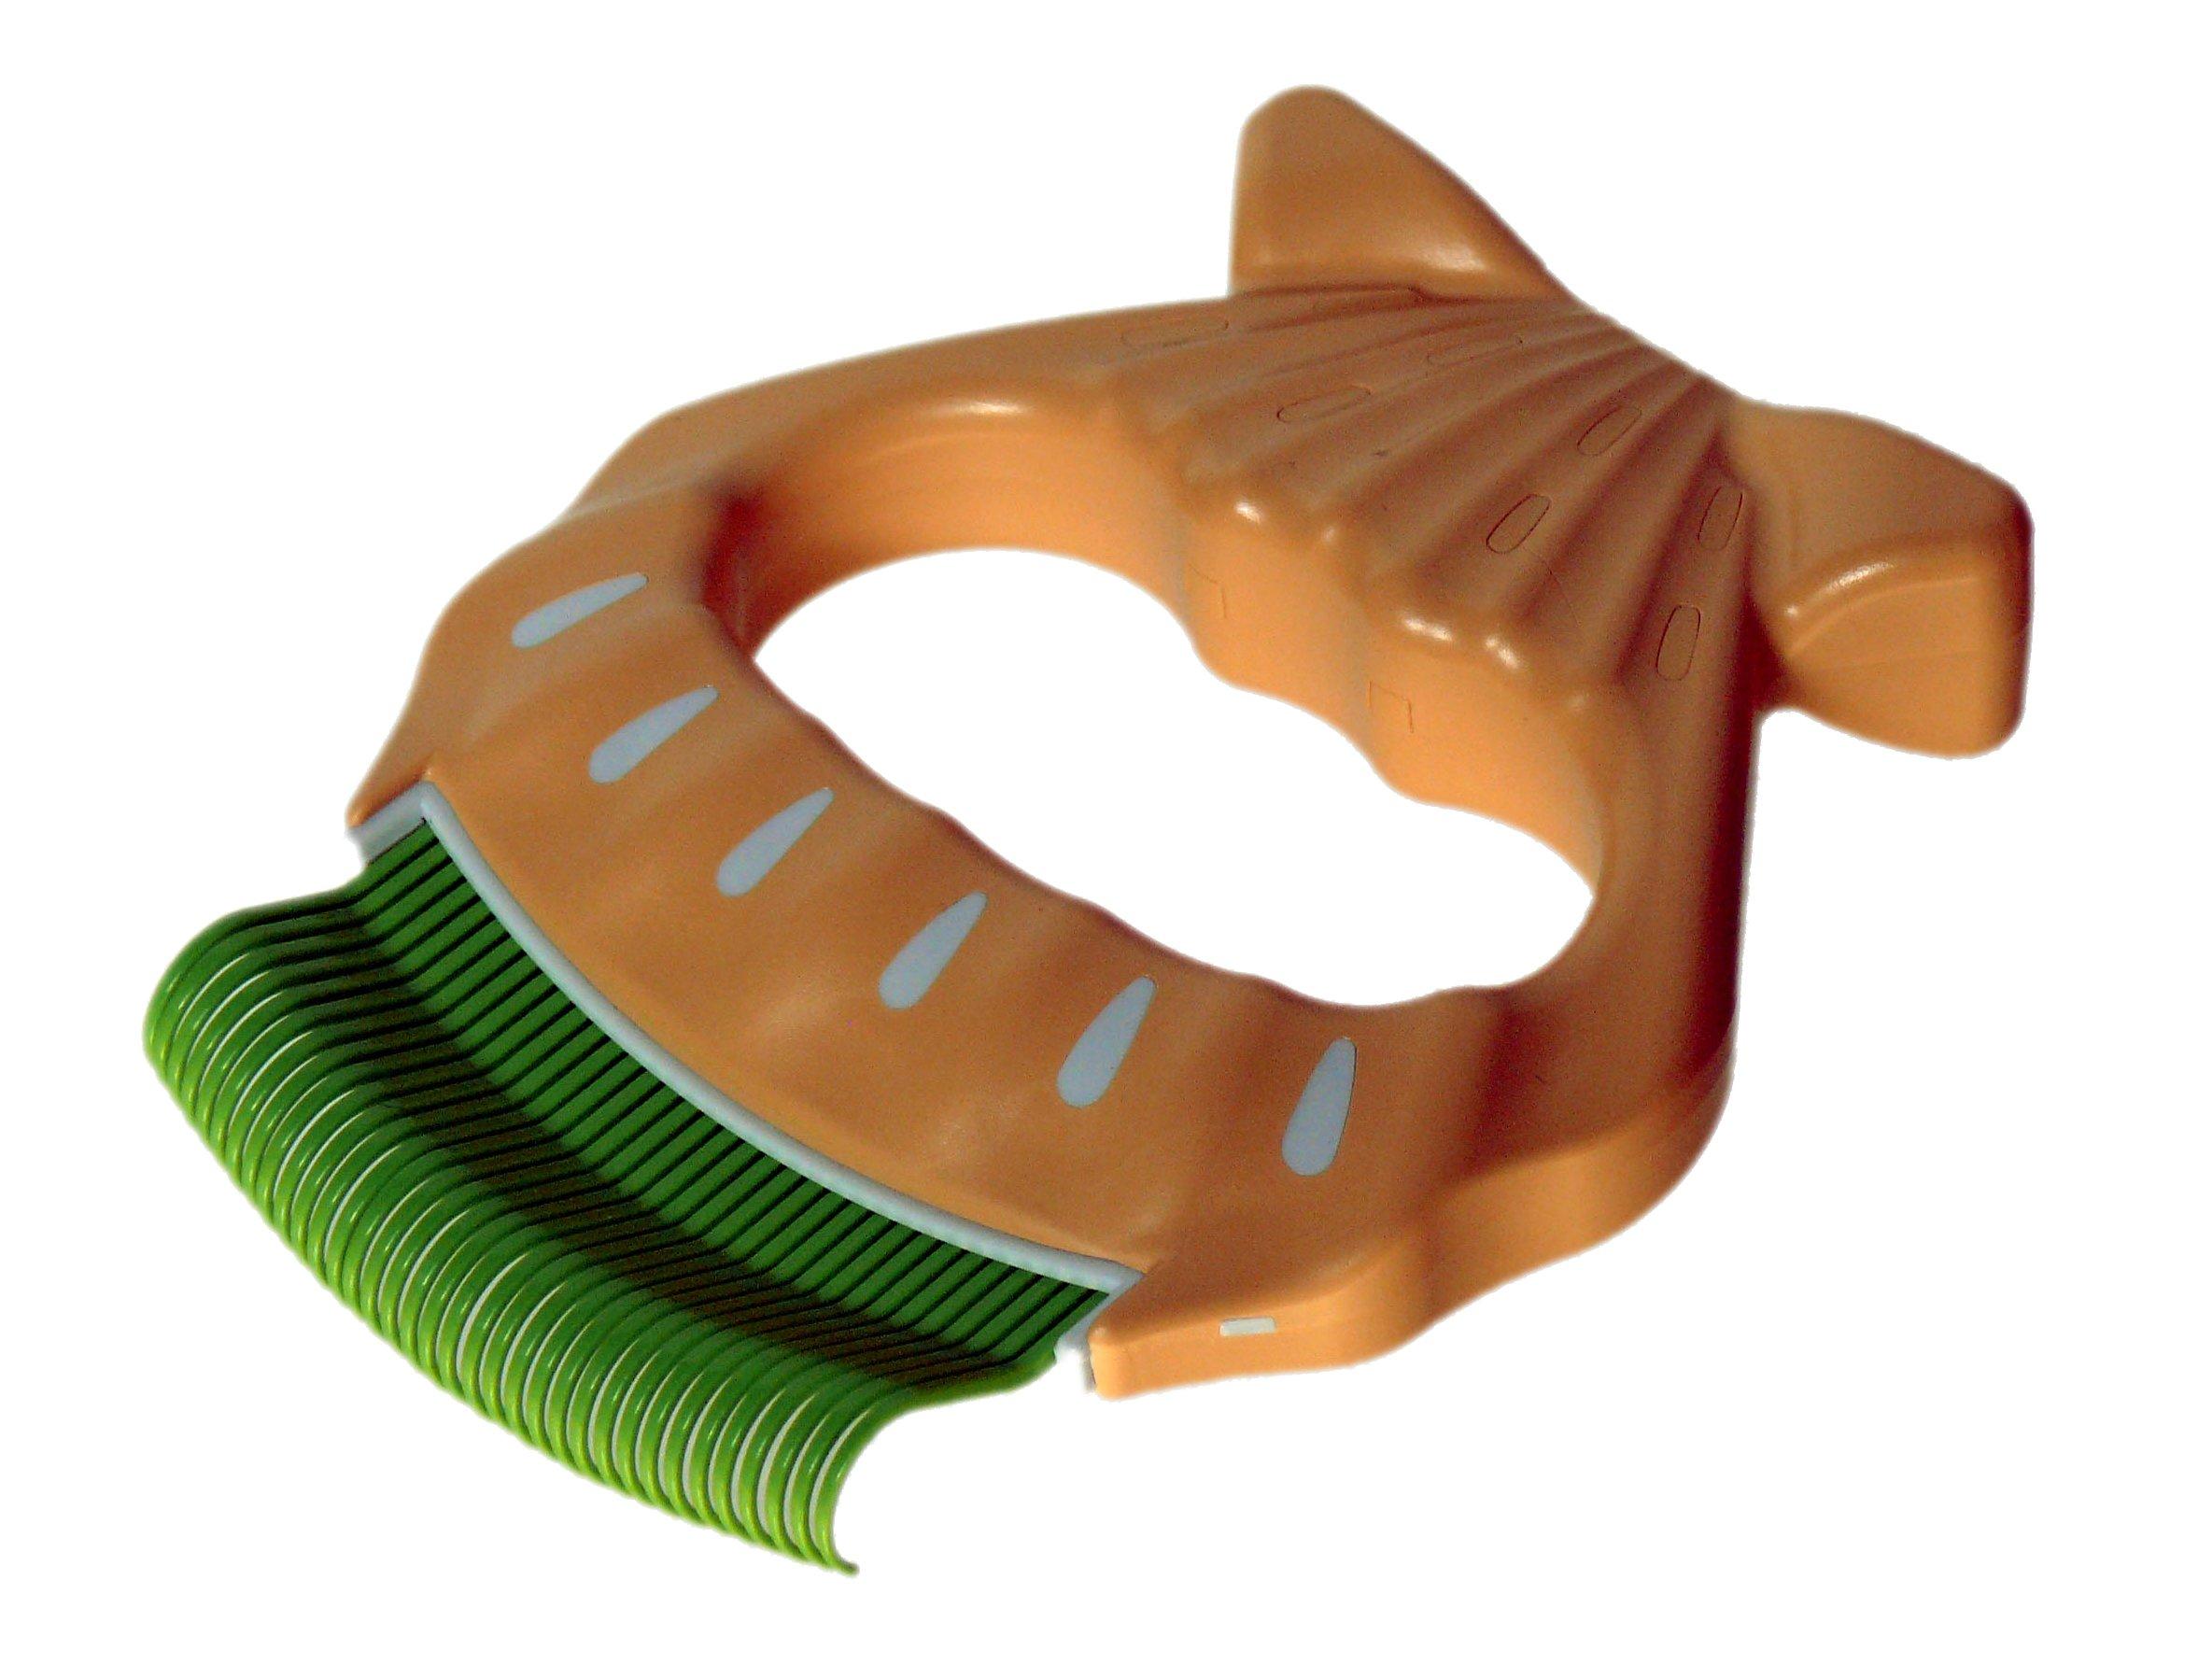 DIATOLIB Philocomb E2 a Gentle, Flexible, Grooming Comb for Pets